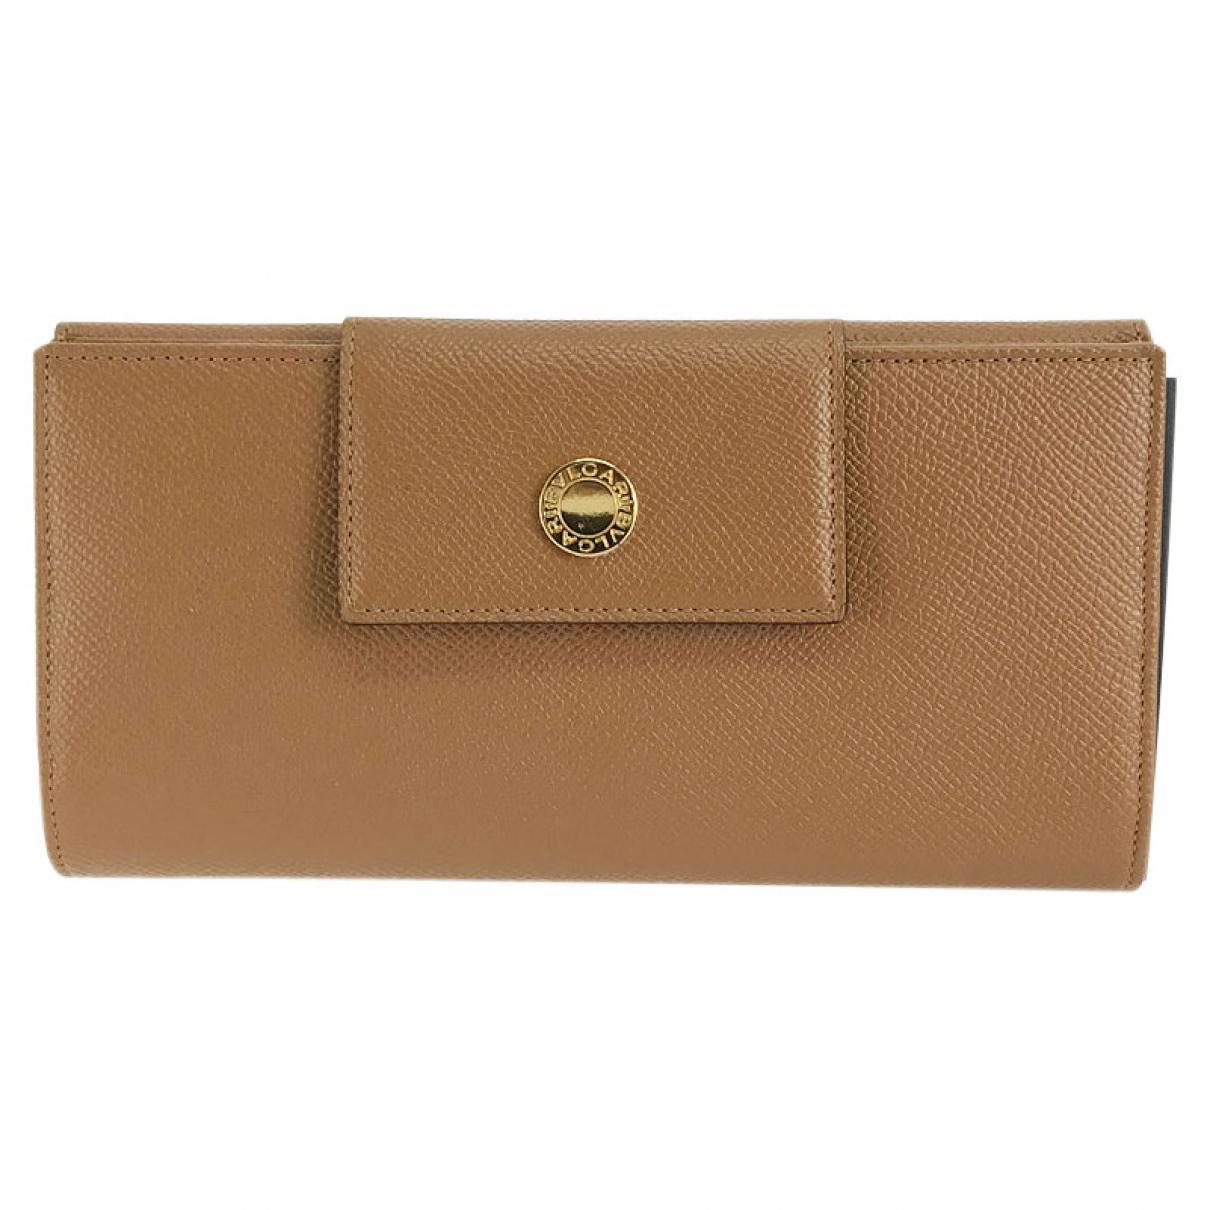 Bvlgari \N Camel Leather wallet for Women \N